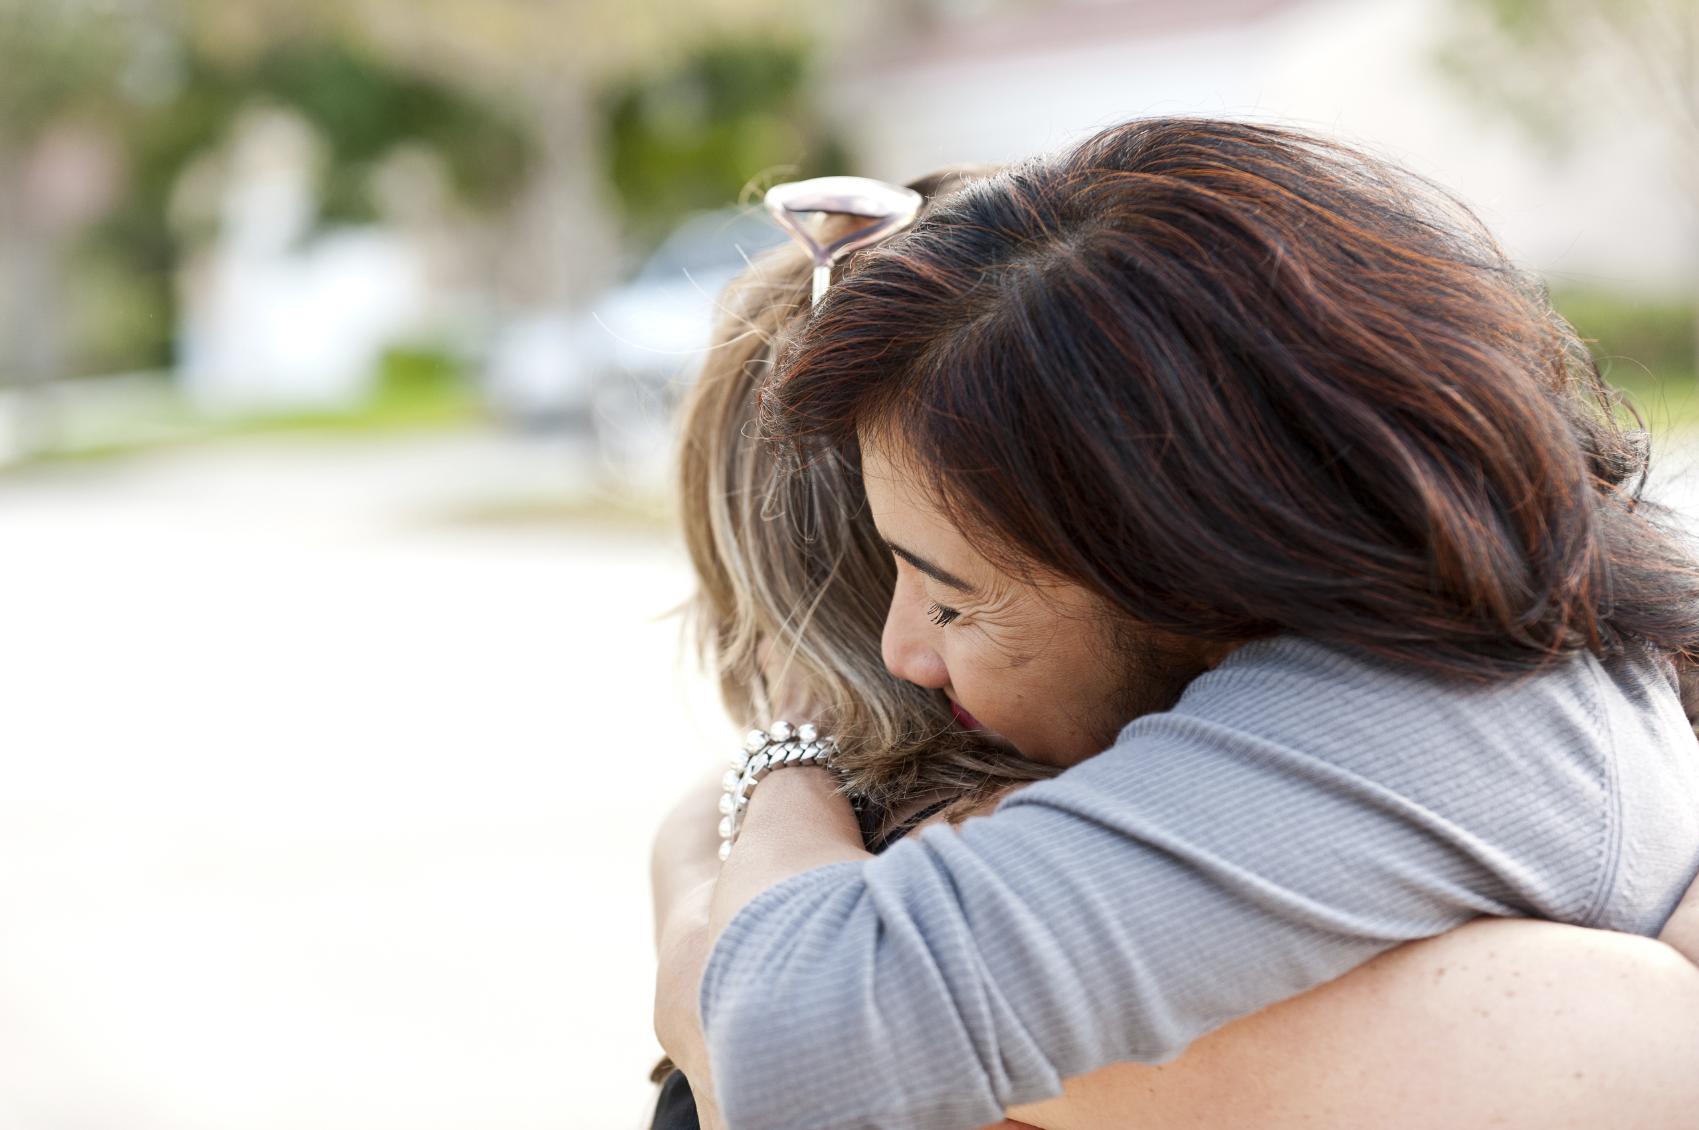 Embraced Hug